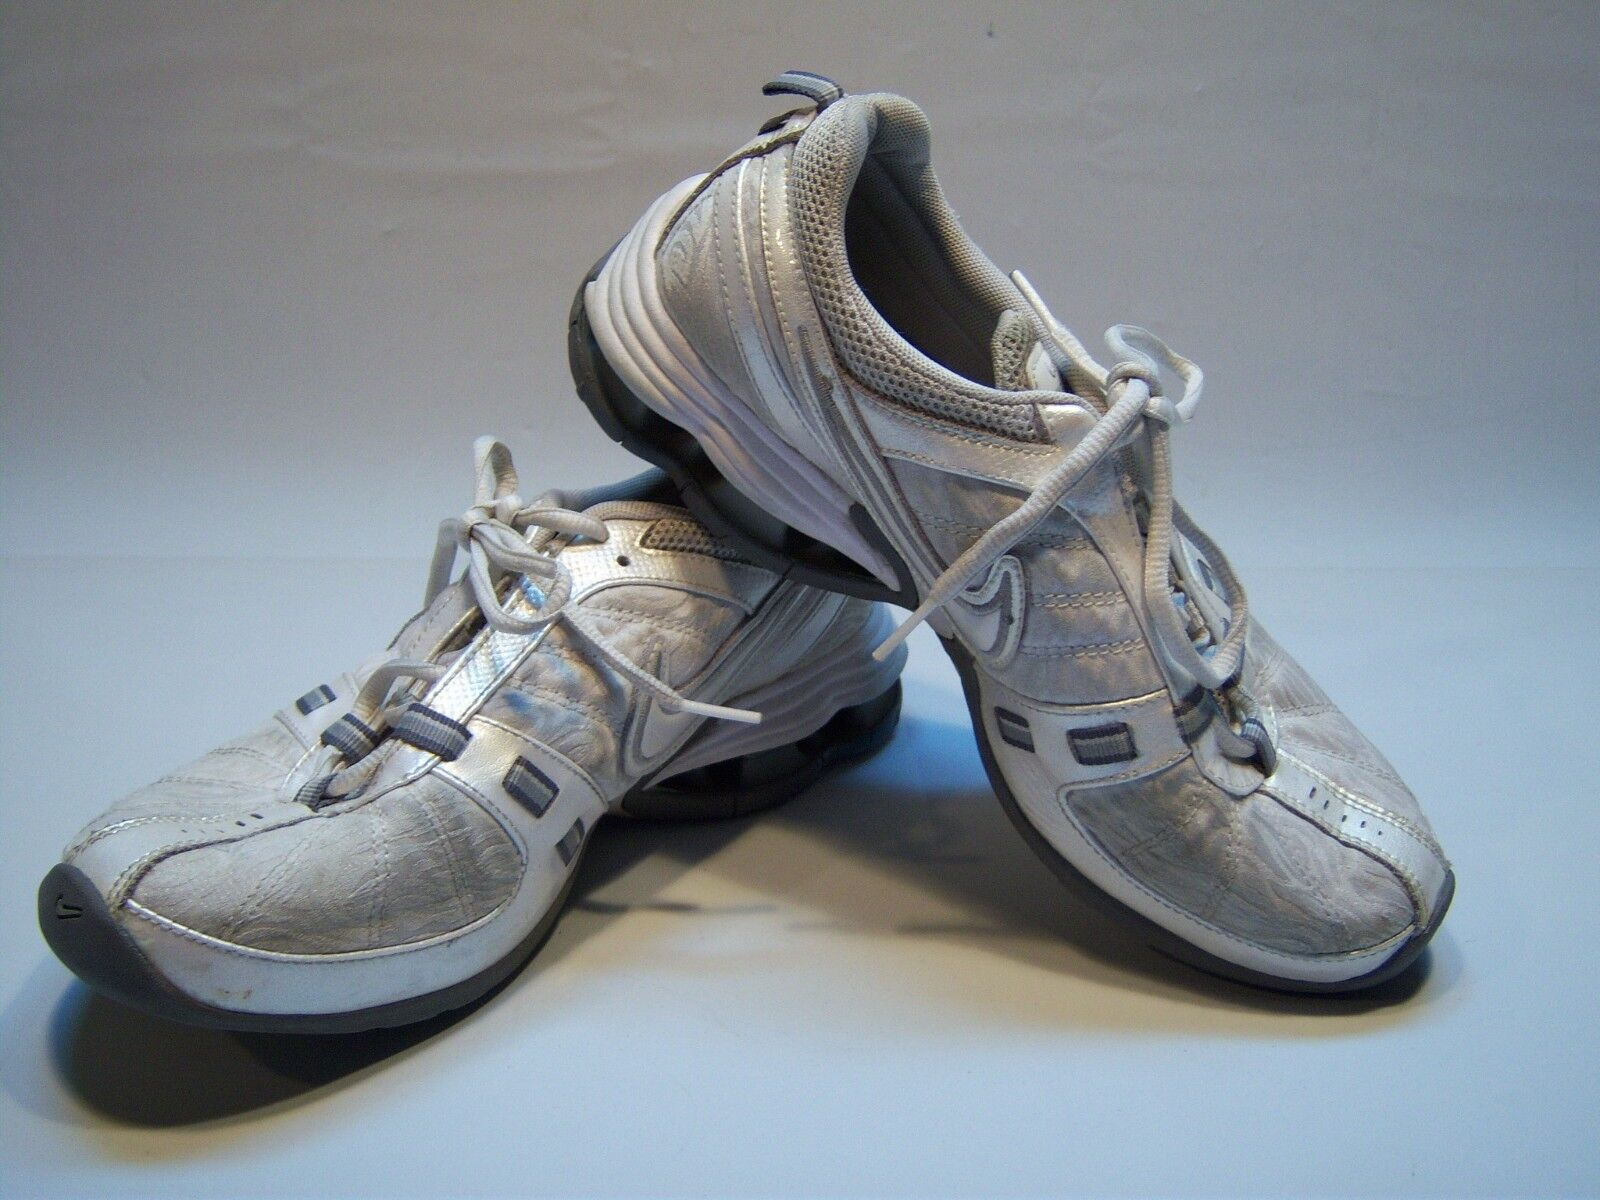 Nike Reax Casual Athletic Sneakers Men's Comfortable